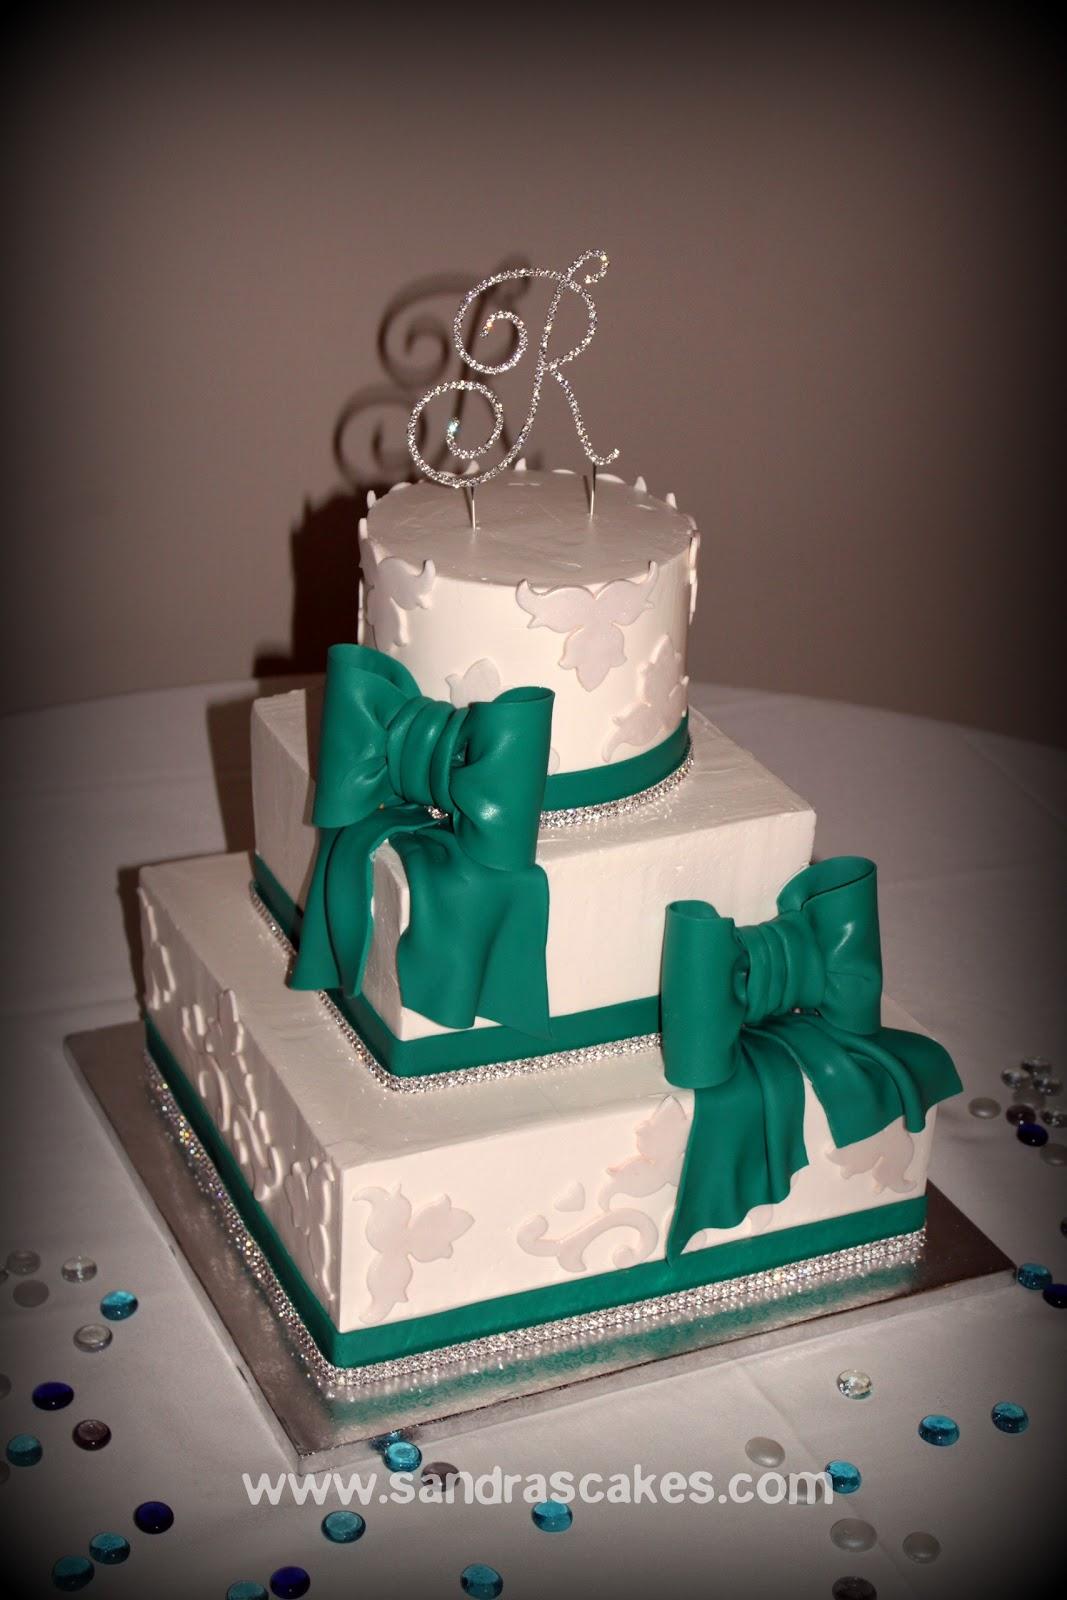 Buttercream Wedding Cake with Bling